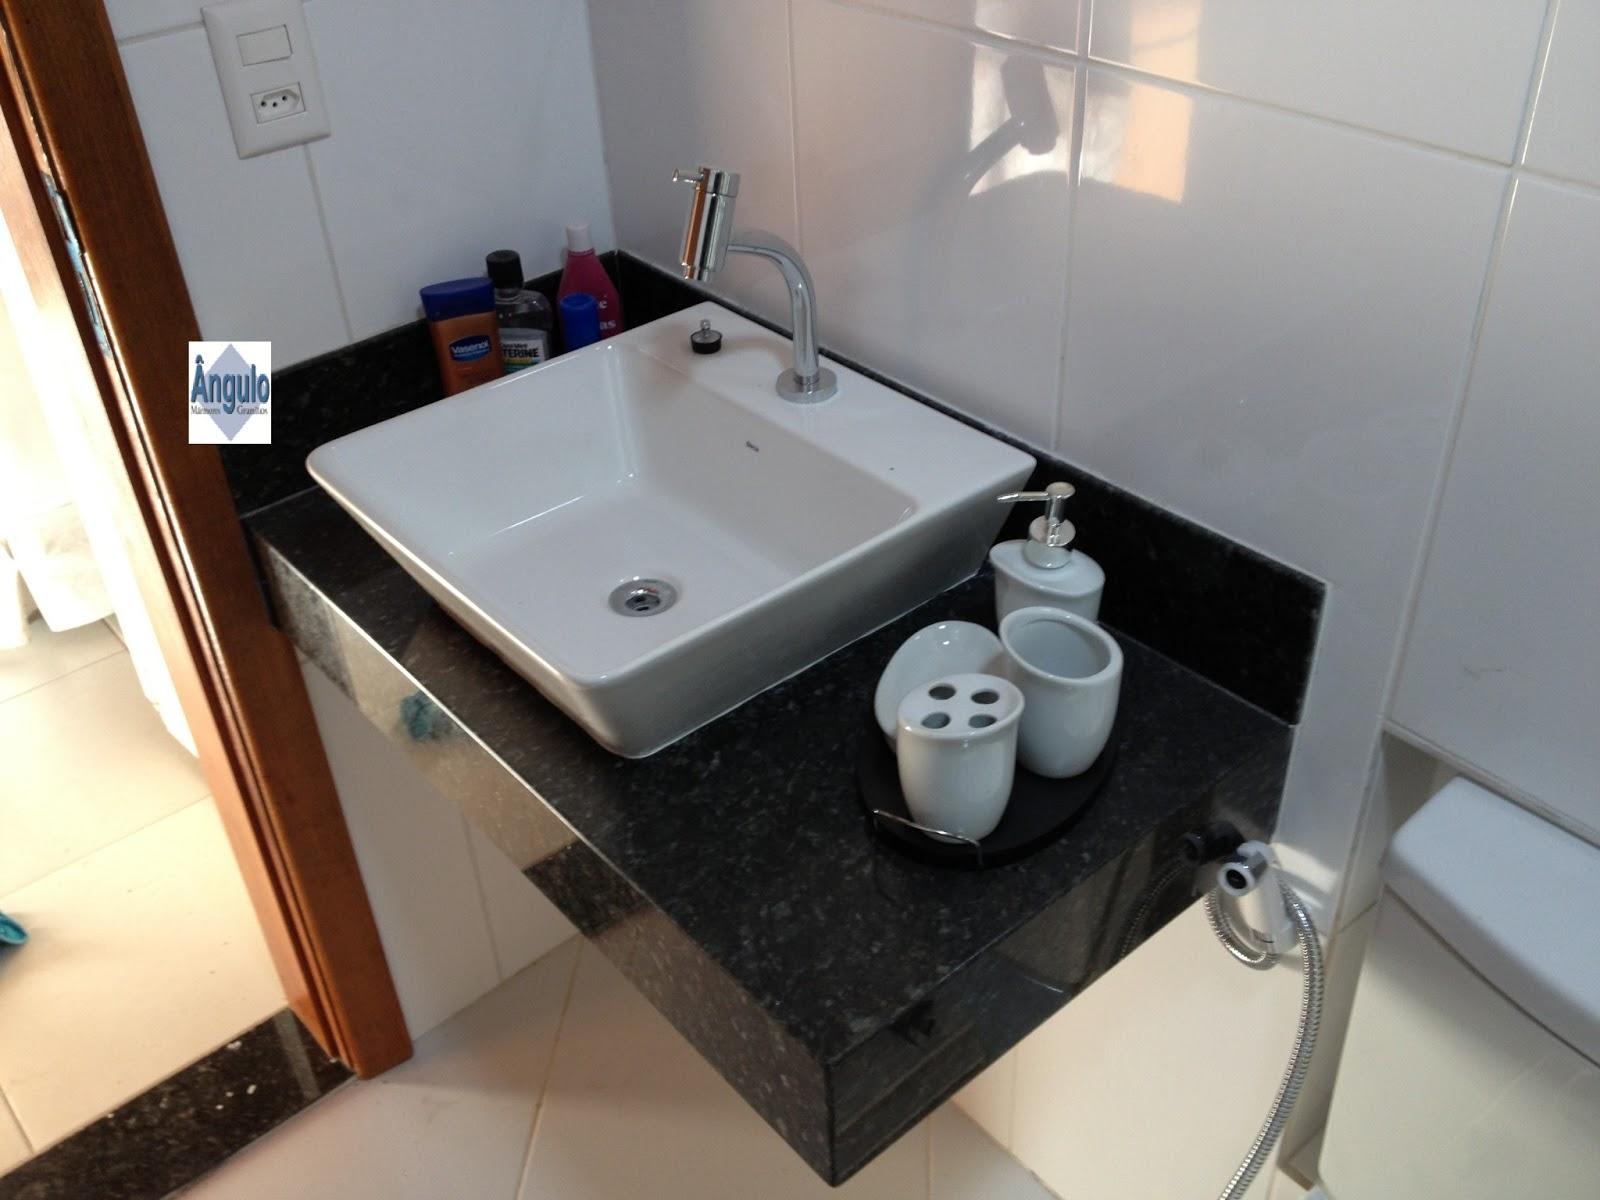 Ângulo Mármores e Granitos: Pia Verde Ubatuba #673F28 1600x1200 Bancada Banheiro Granito Verde Ubatuba